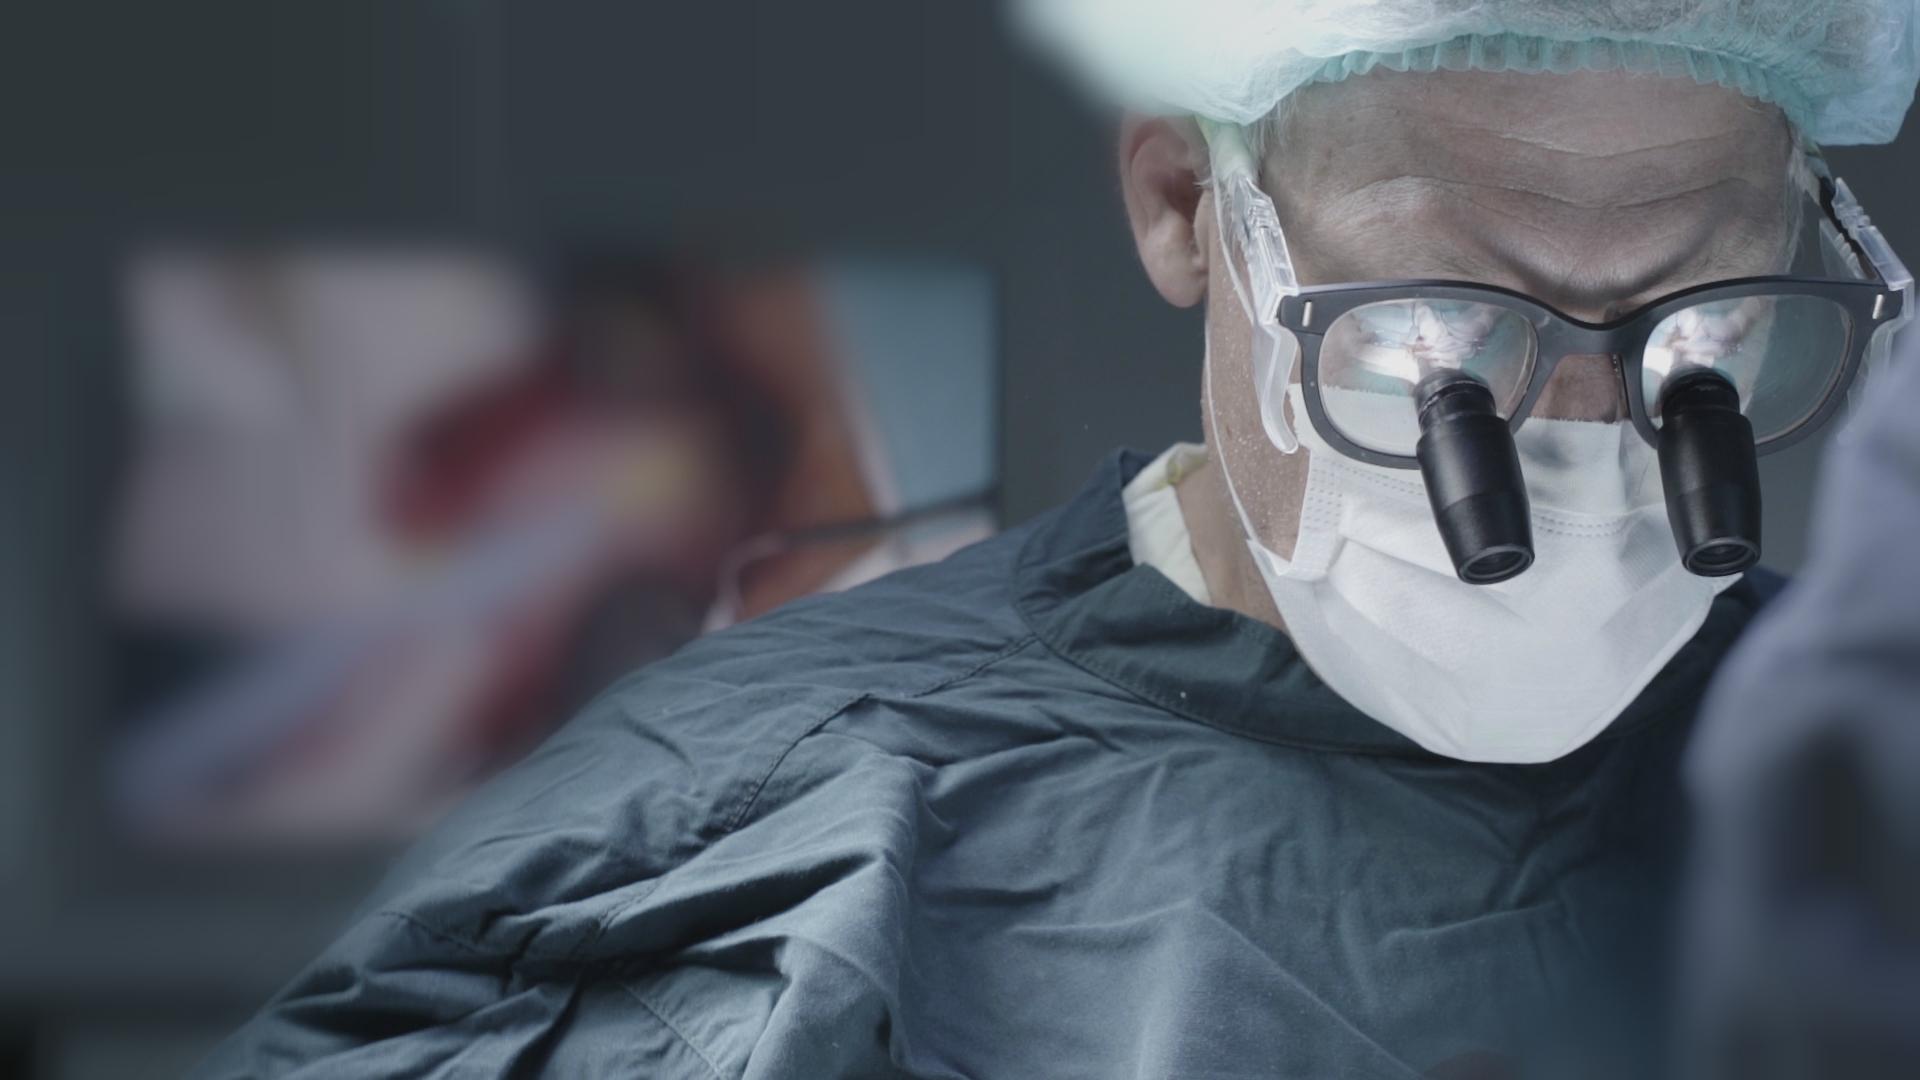 Neurosurgeon Dr. John Weaver in surgery.